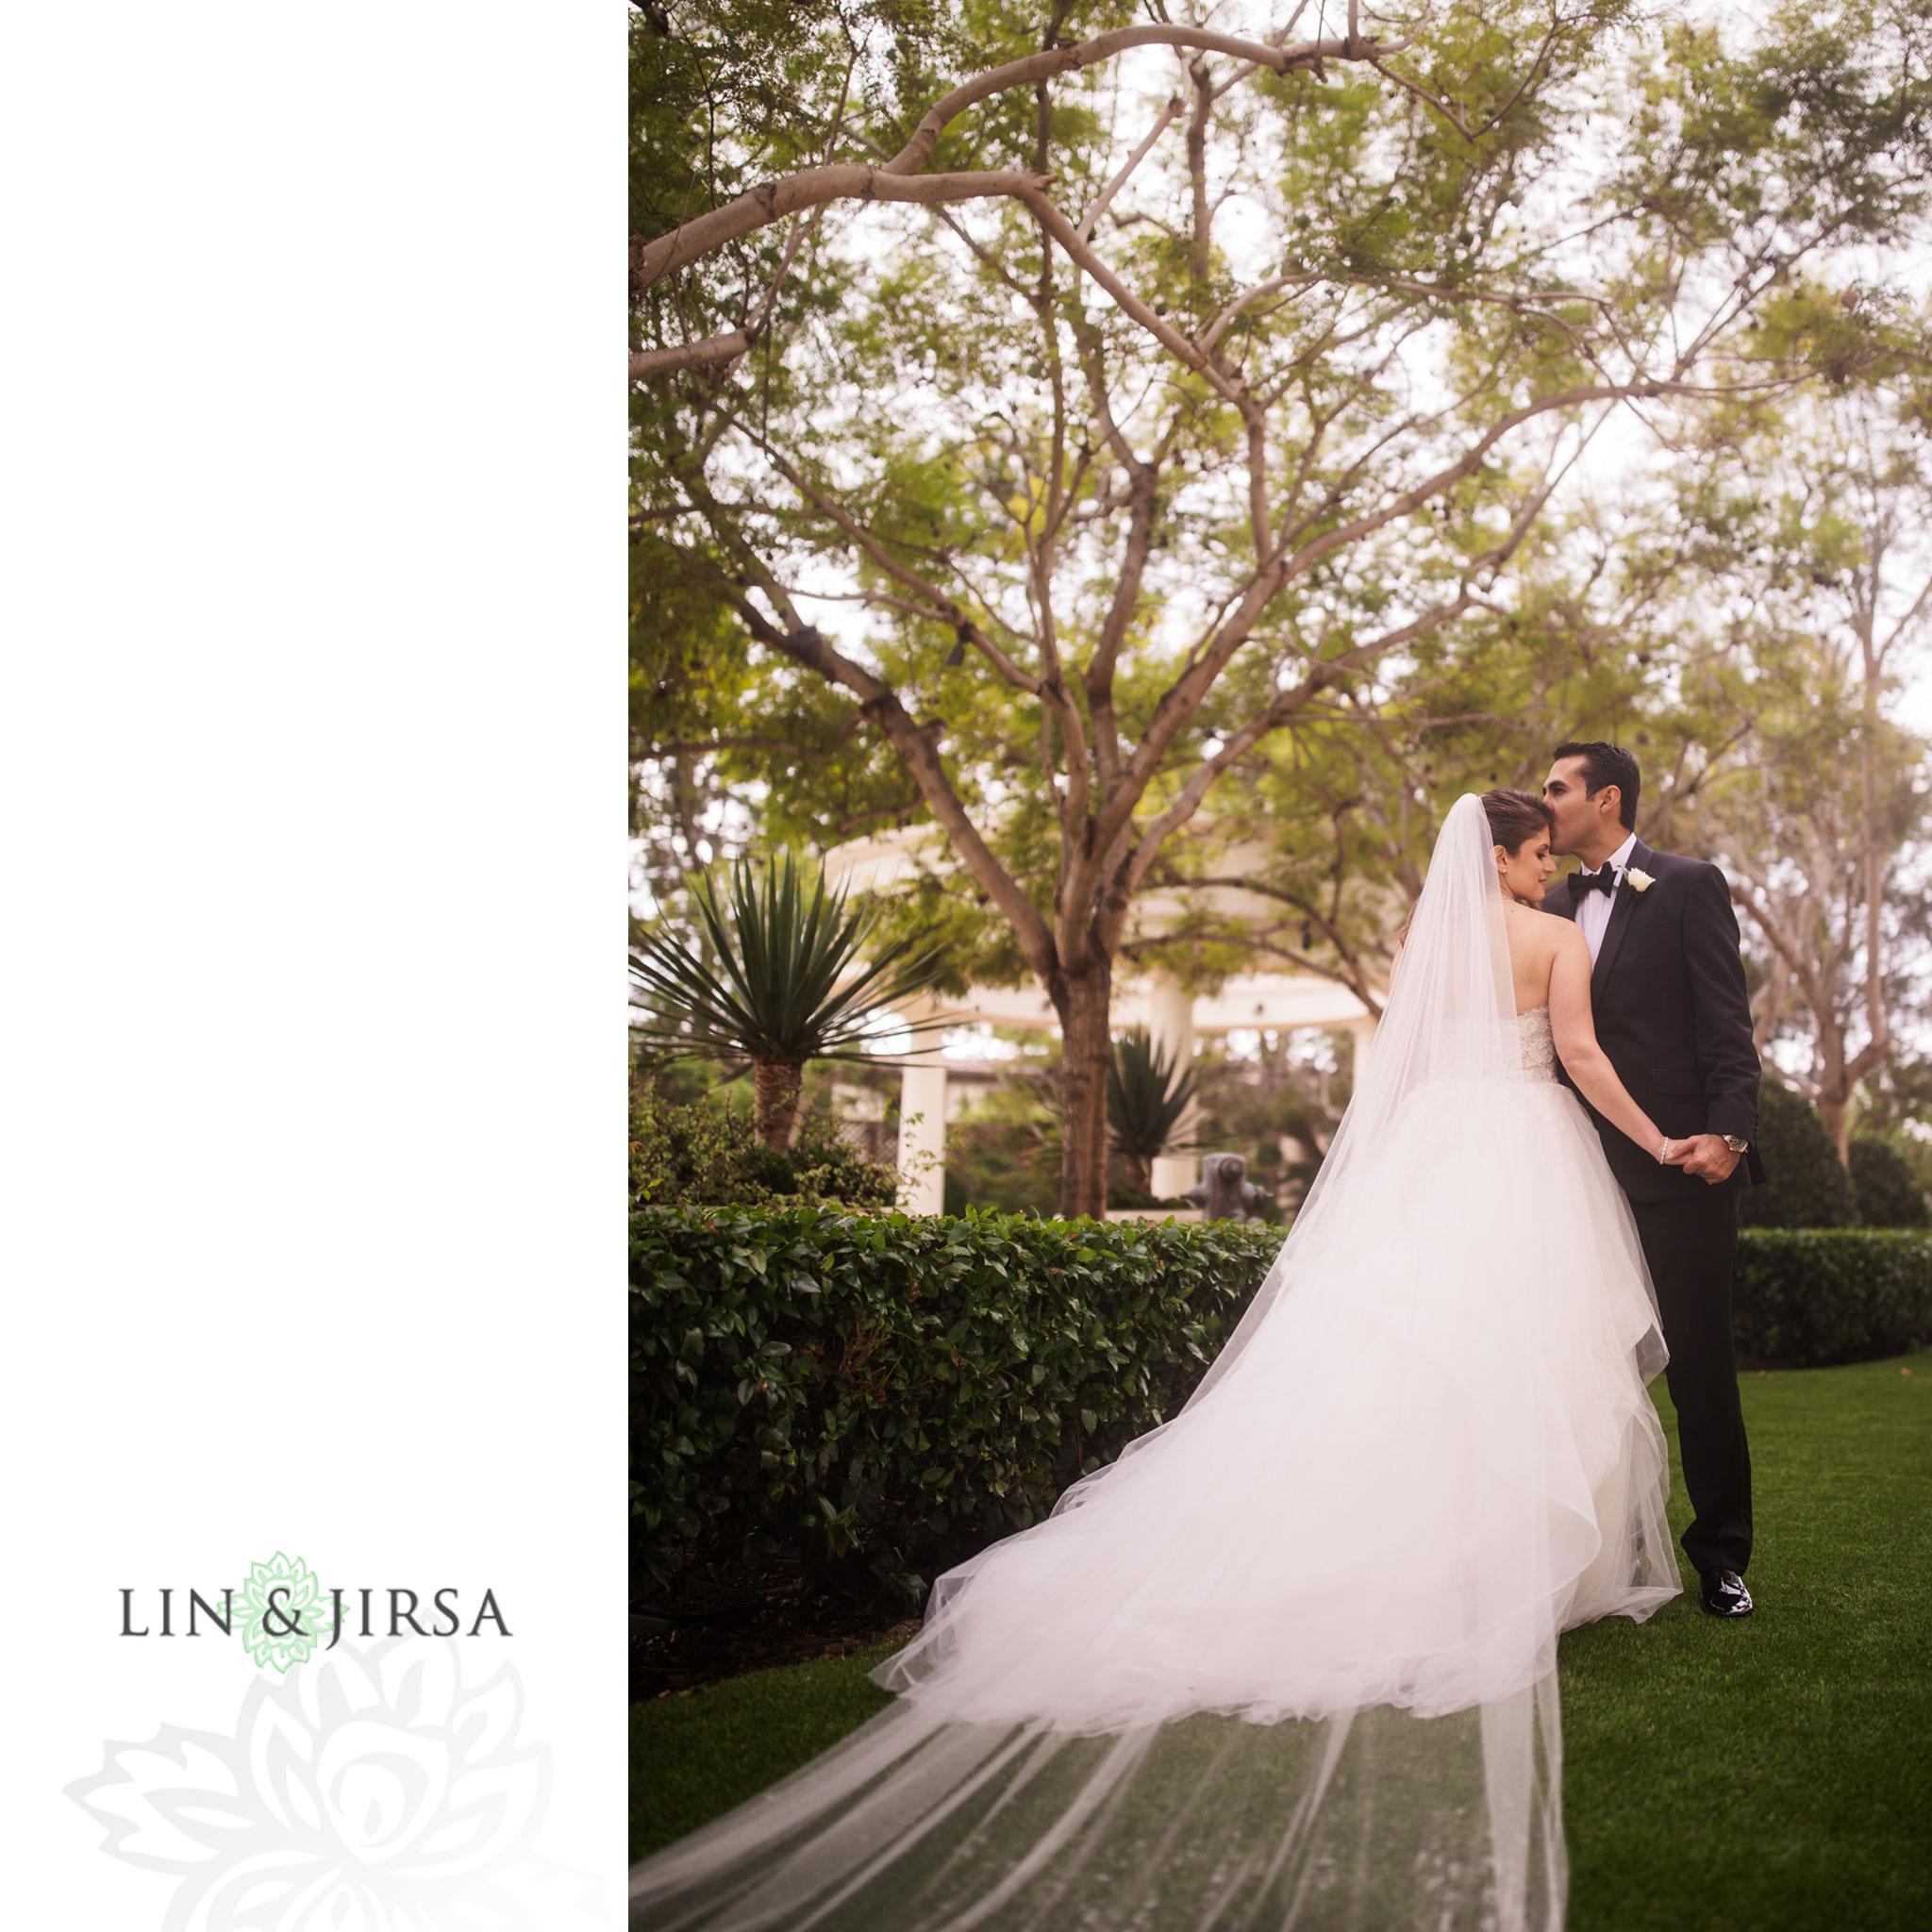 09 monarch beach resort laguna niguel persian wedding photography